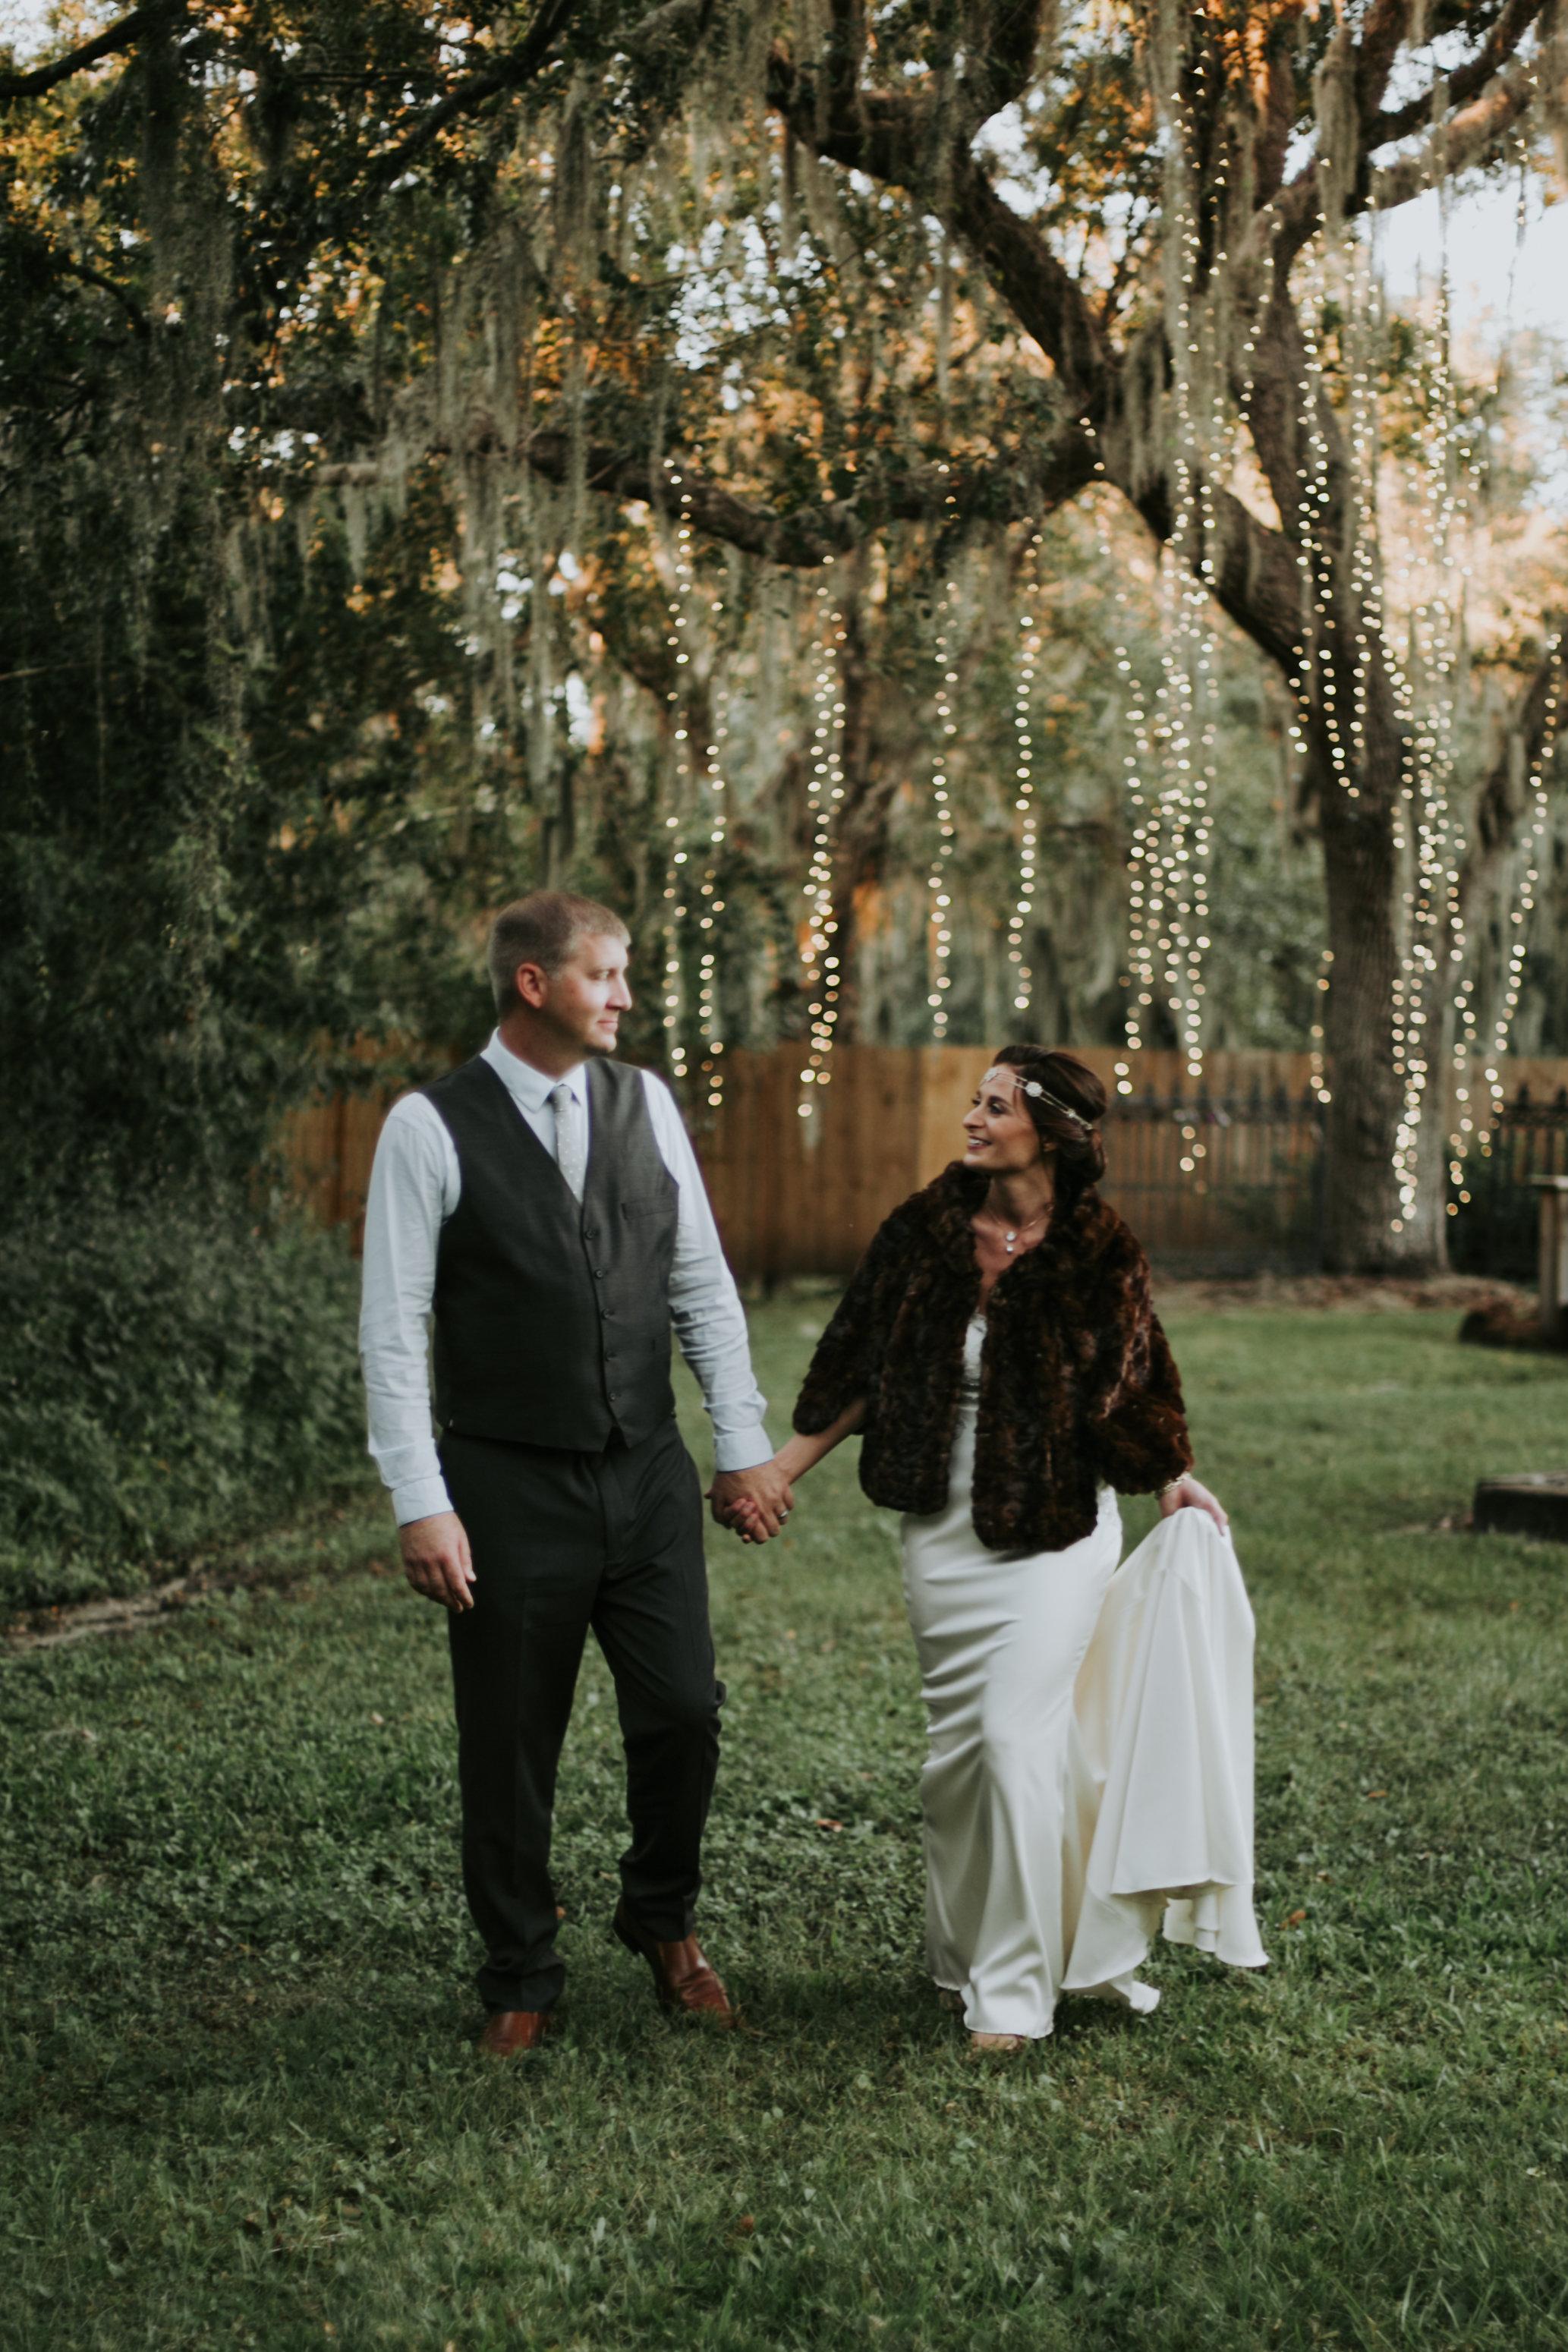 Bakers Ranch_ Wedding venue_all inclusive_wedding Nick + Katie (9).jpg